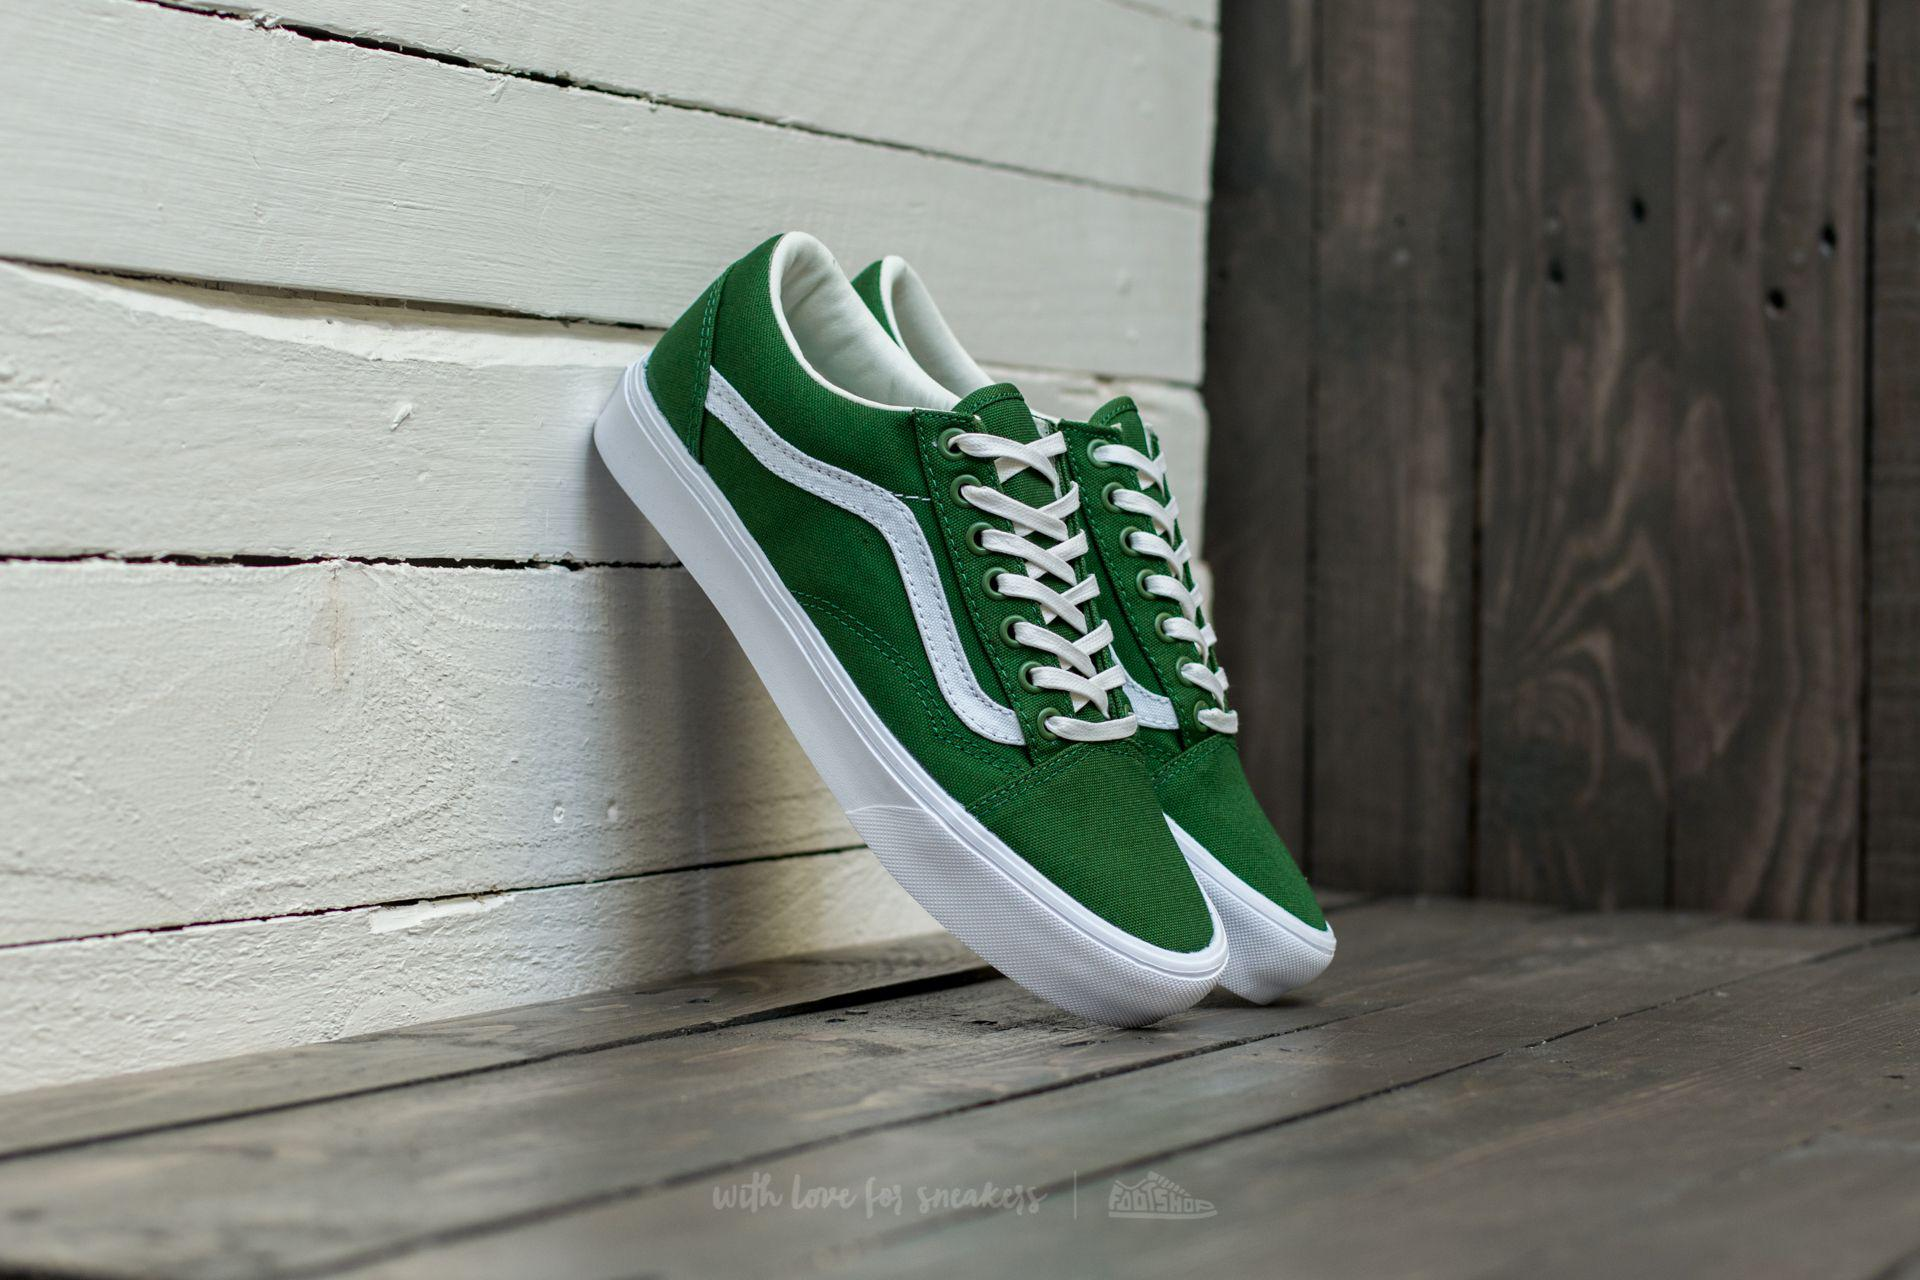 Lyst - Vans Old Skool Lite (canvas) Juniper  True White in Green 1d5ff40b9